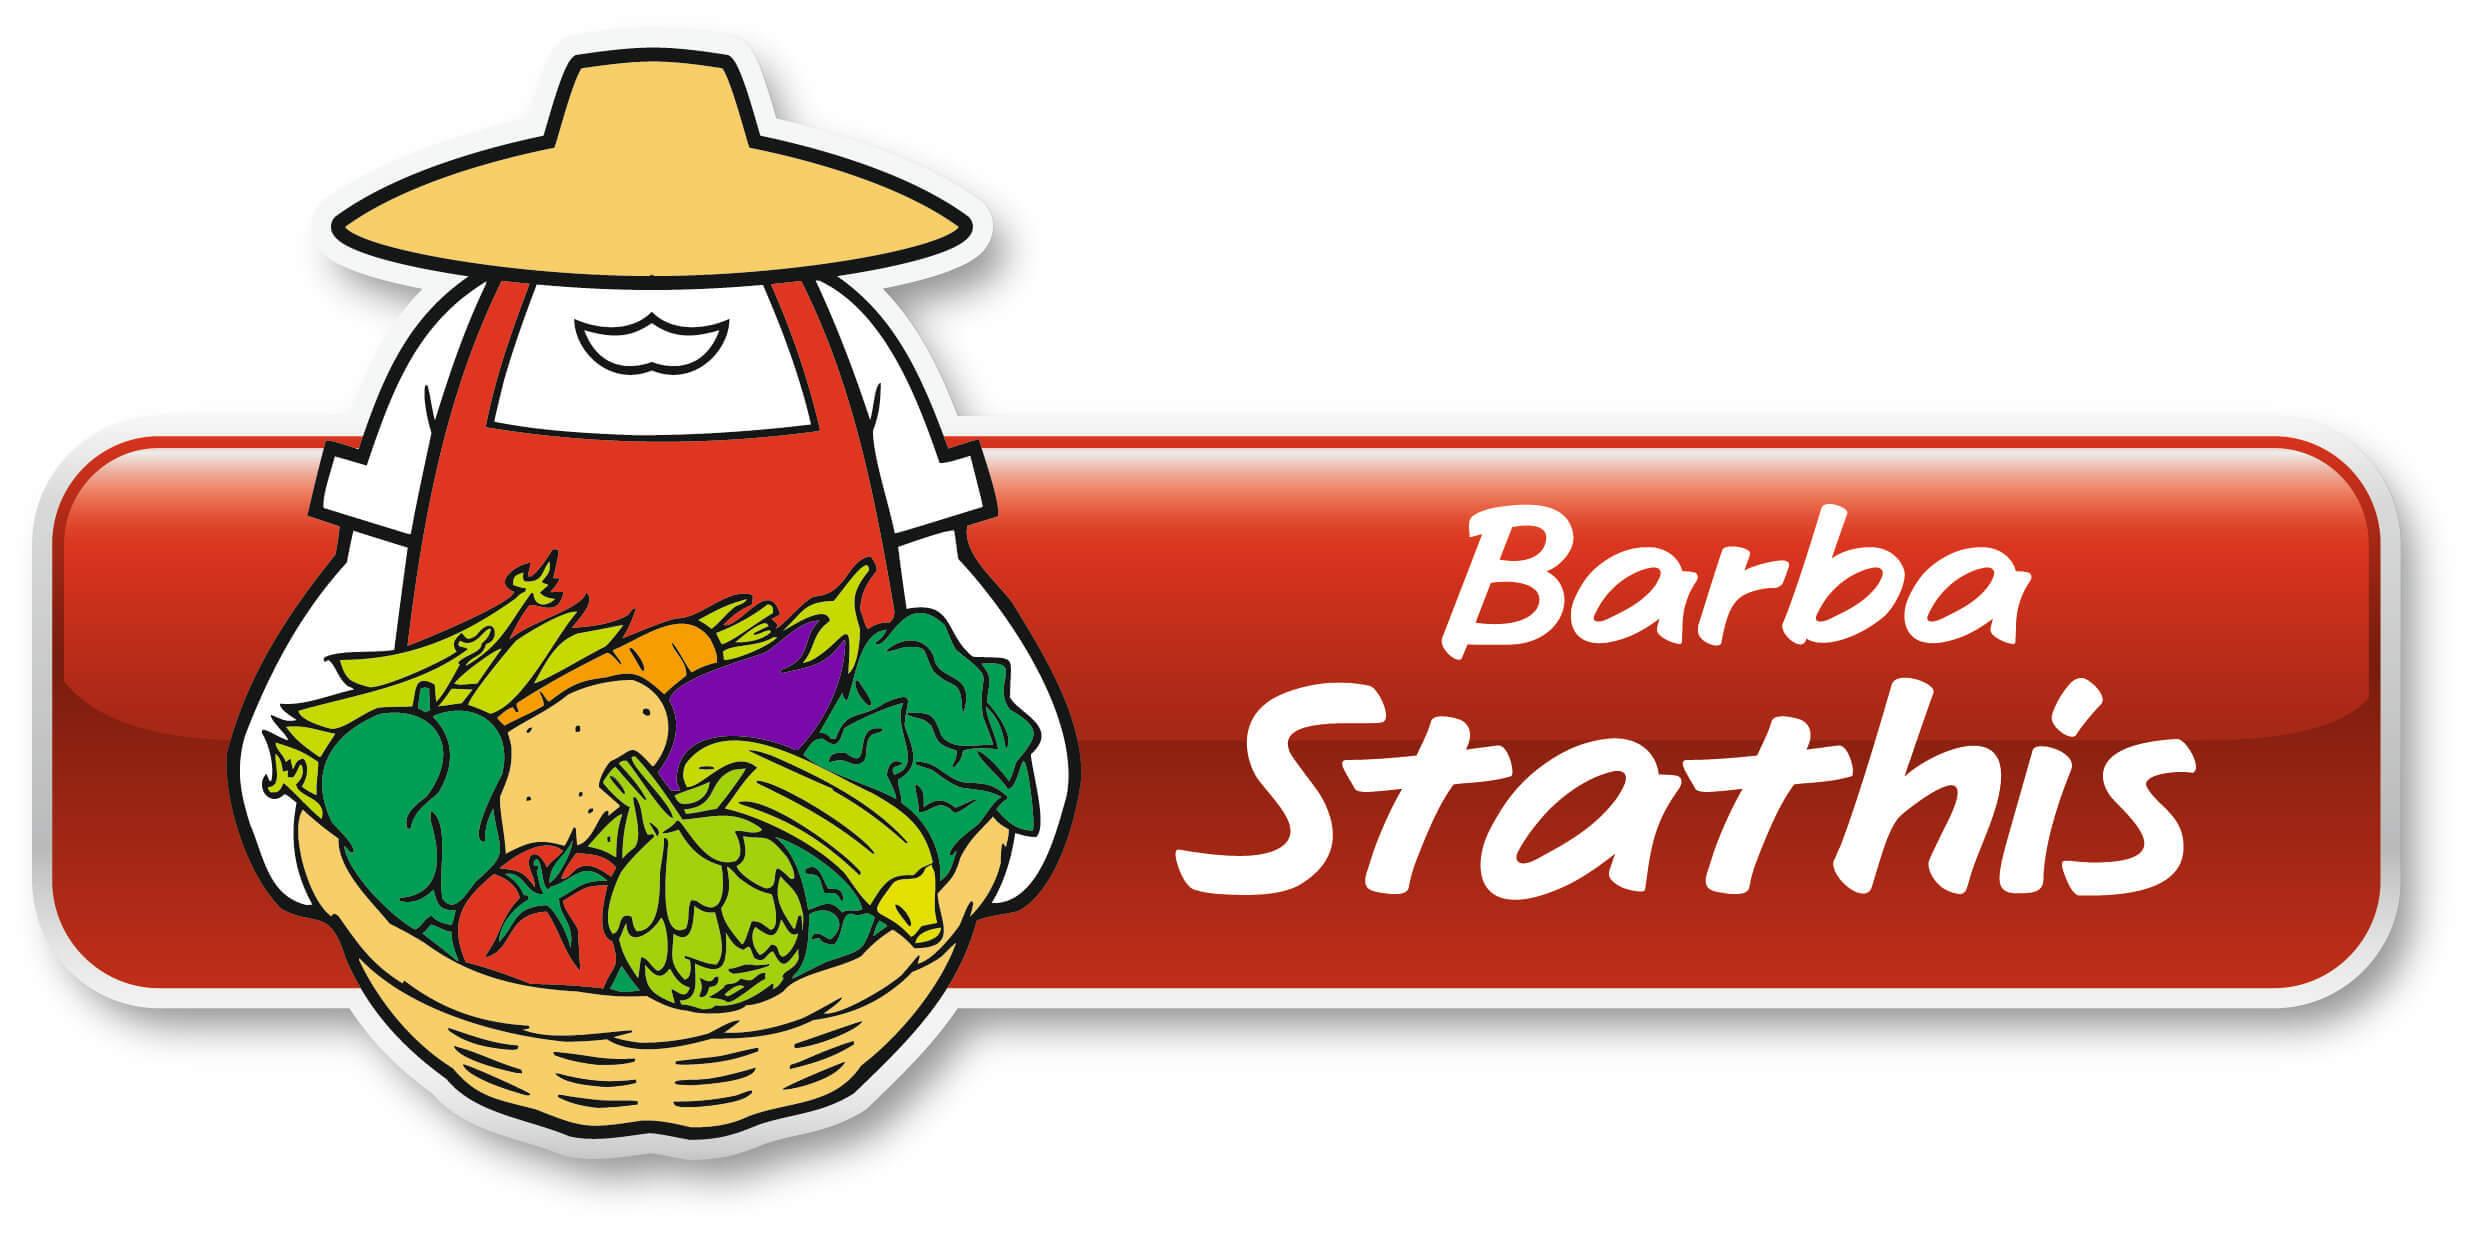 Barba Stathis